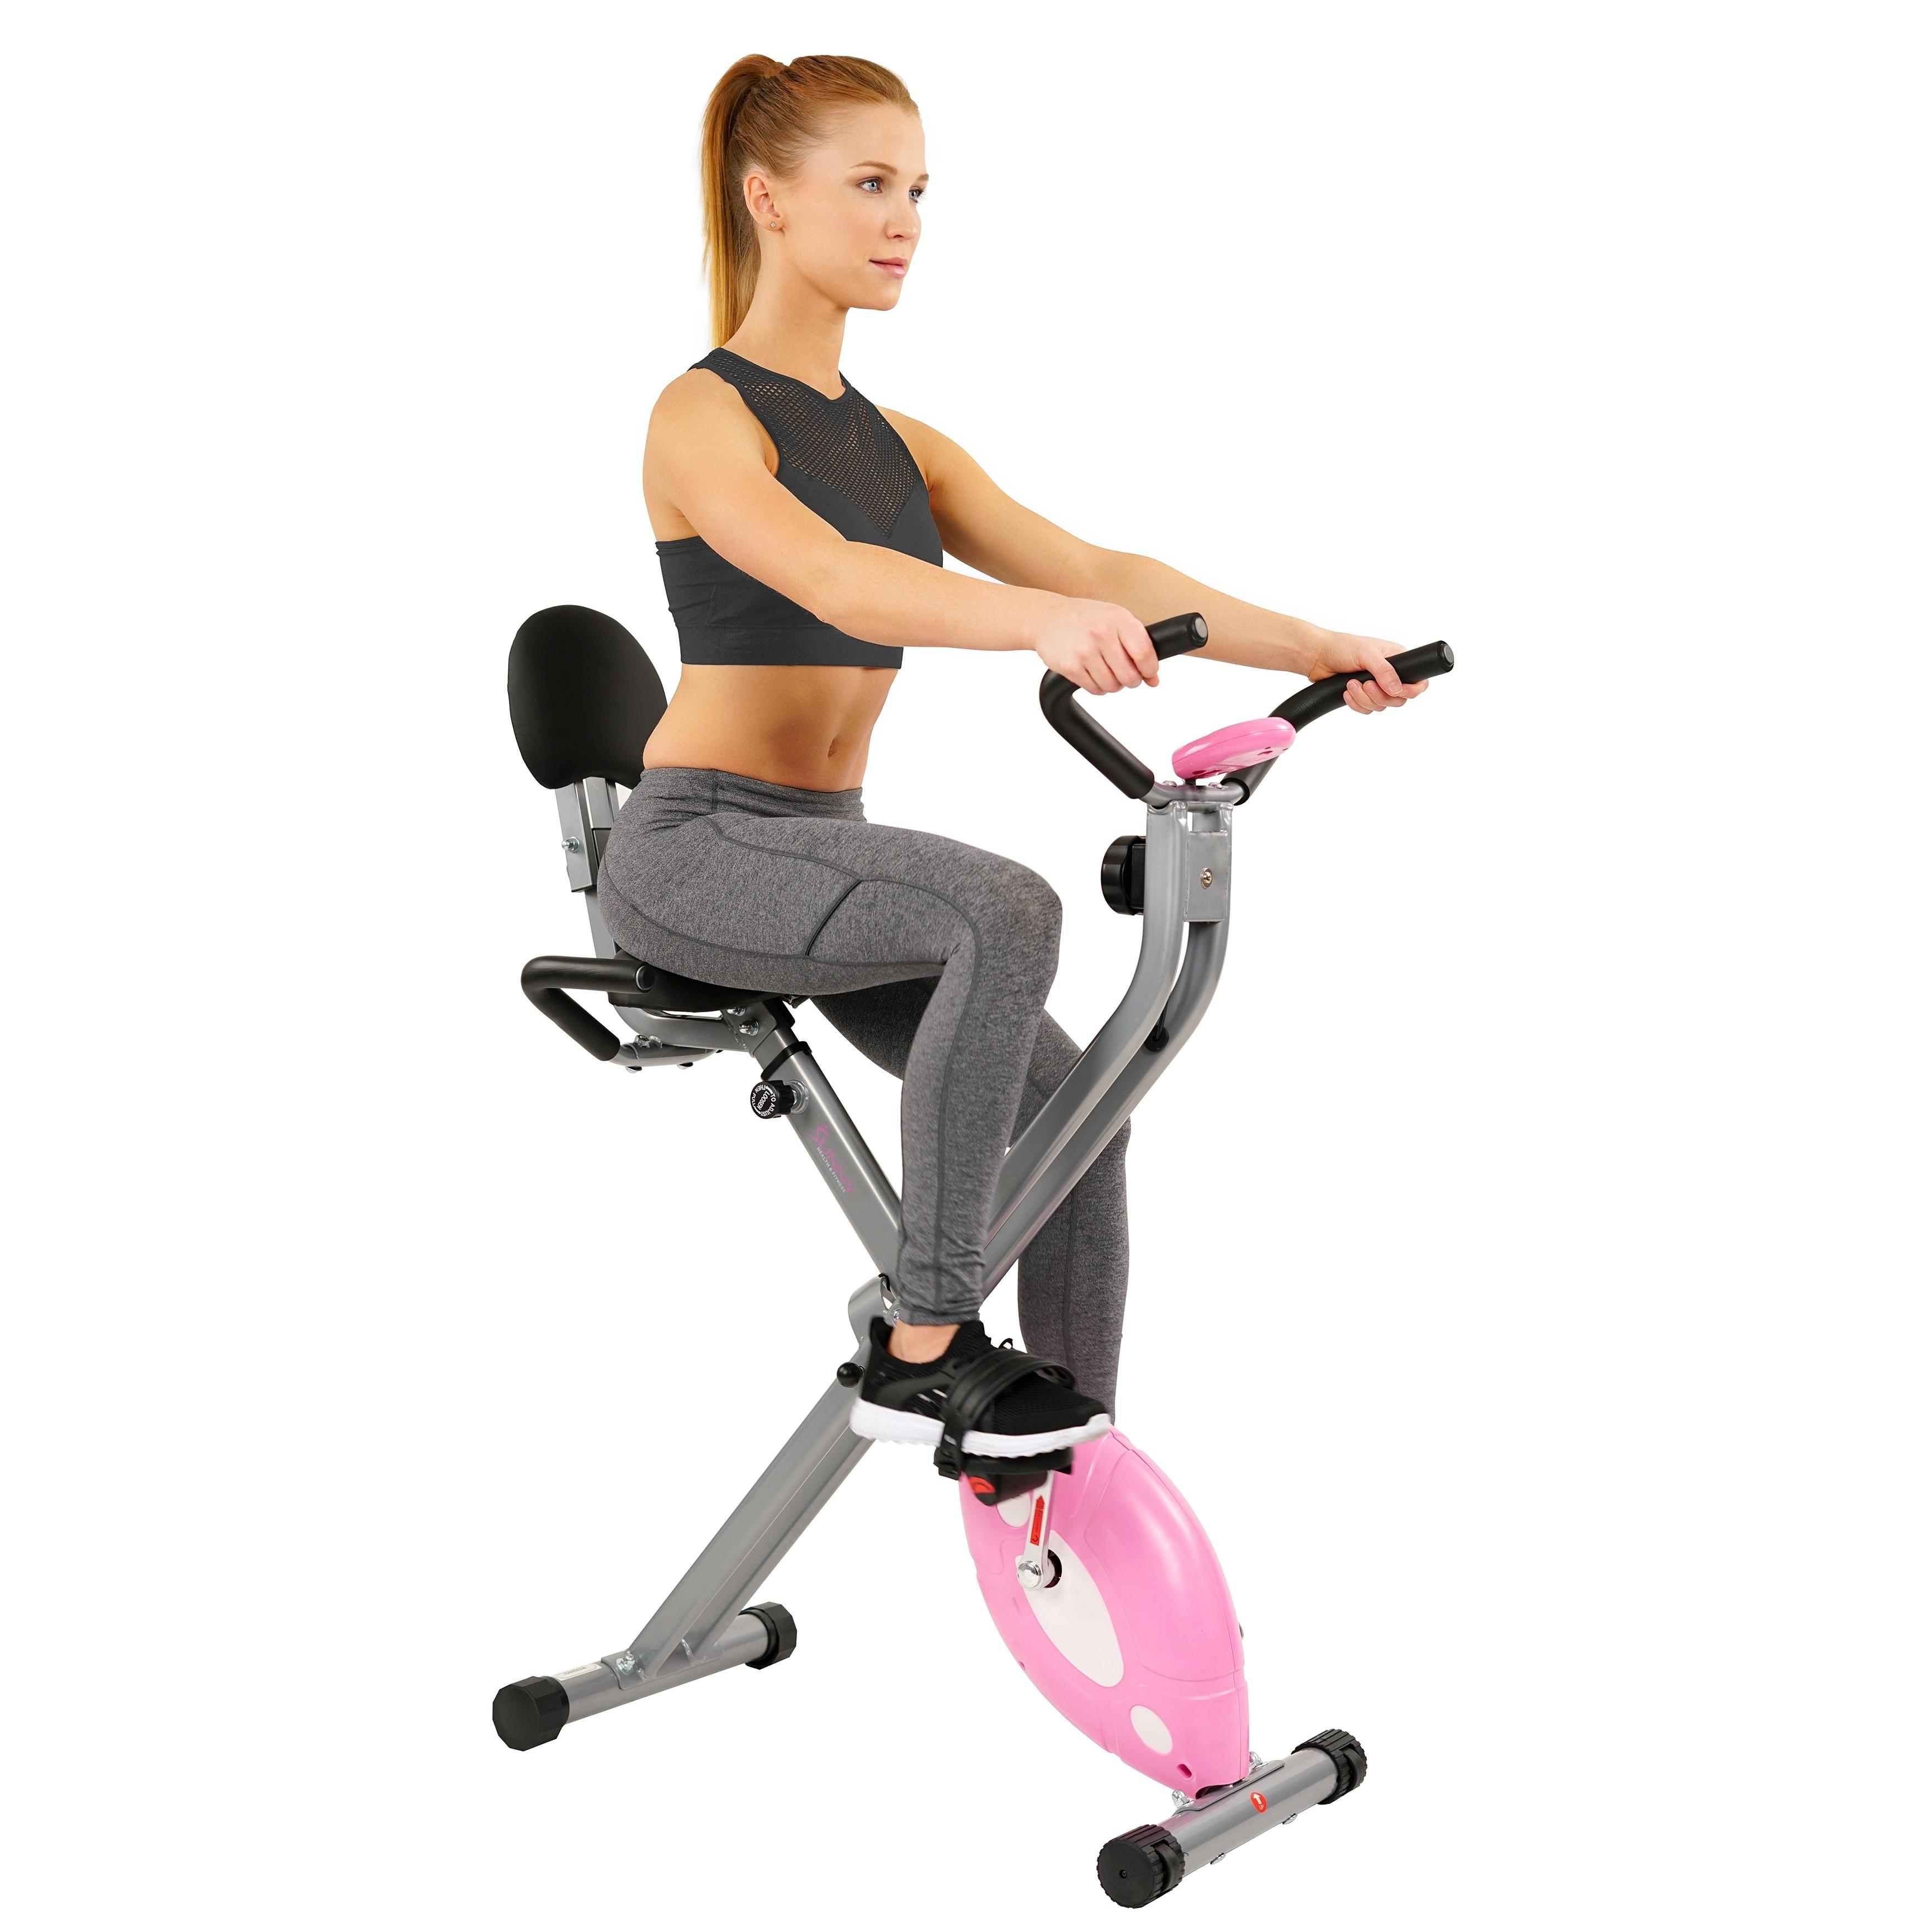 Sunny Health and Fitness  Bike  Pink Folding Recumbent New